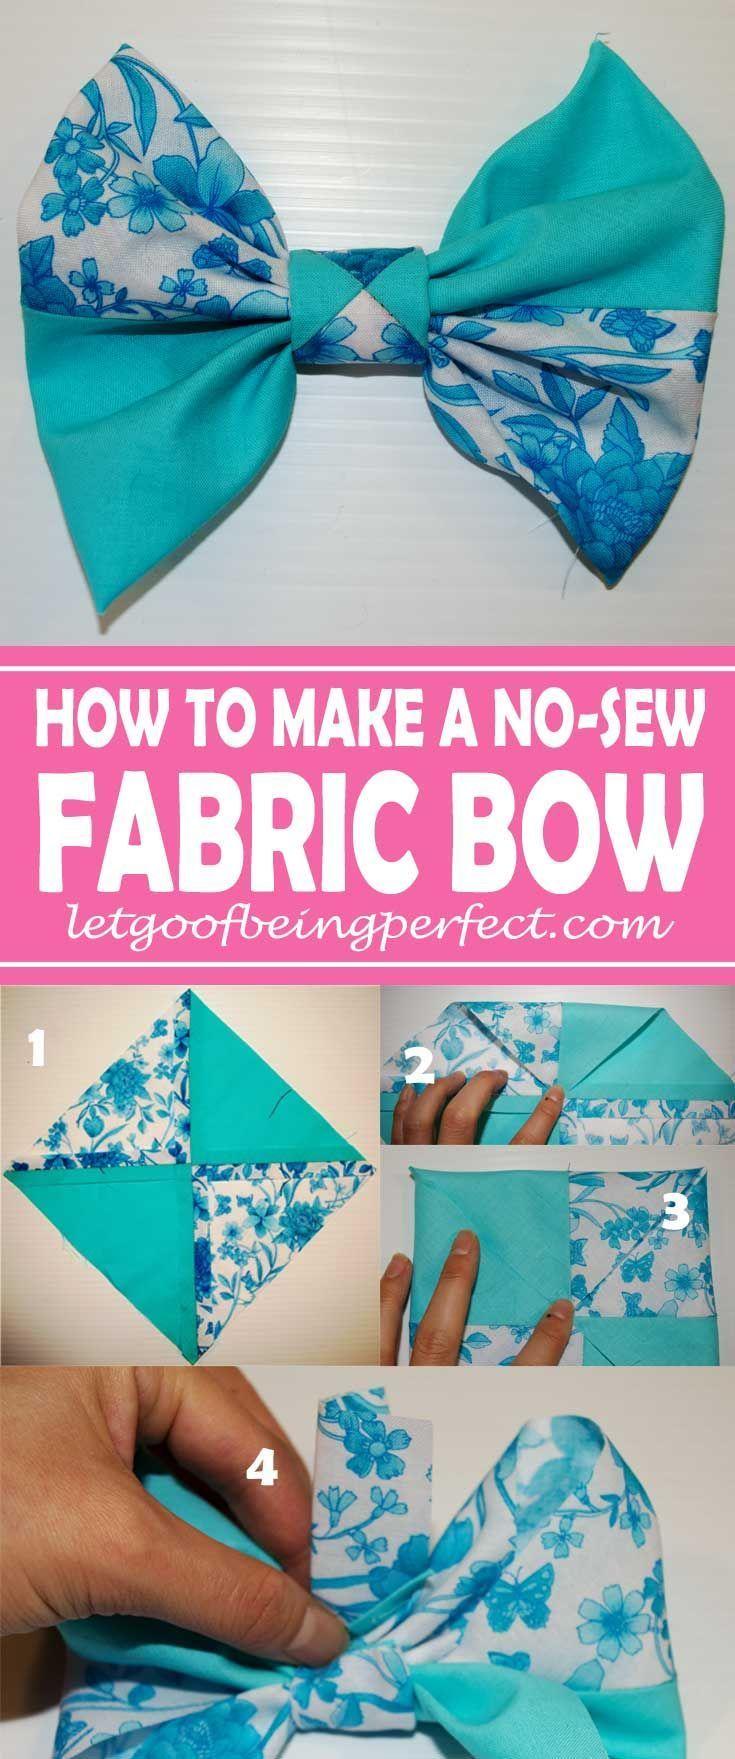 Making Fabric Bows Bows Bows Bows Everywhere